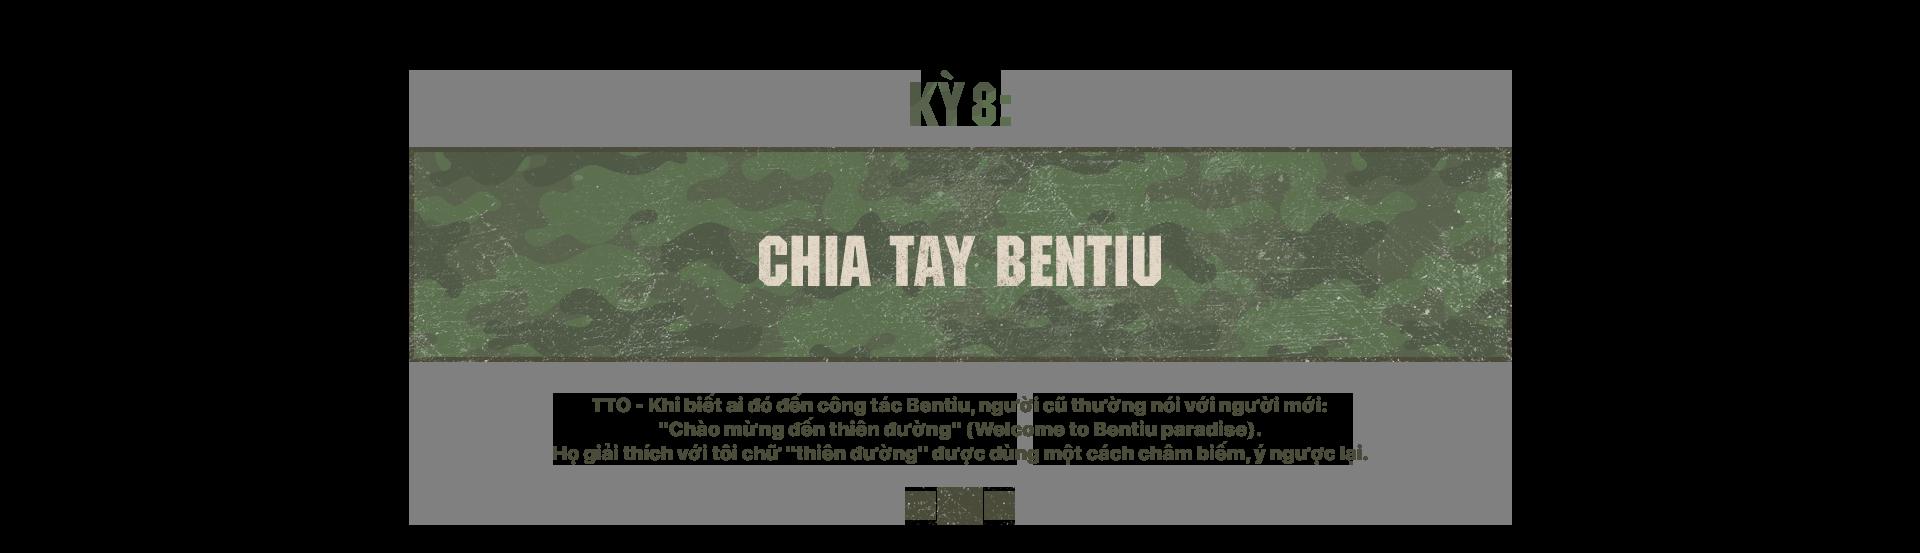 Kỳ cuối: Chia tay Bentiu - Ảnh 1.